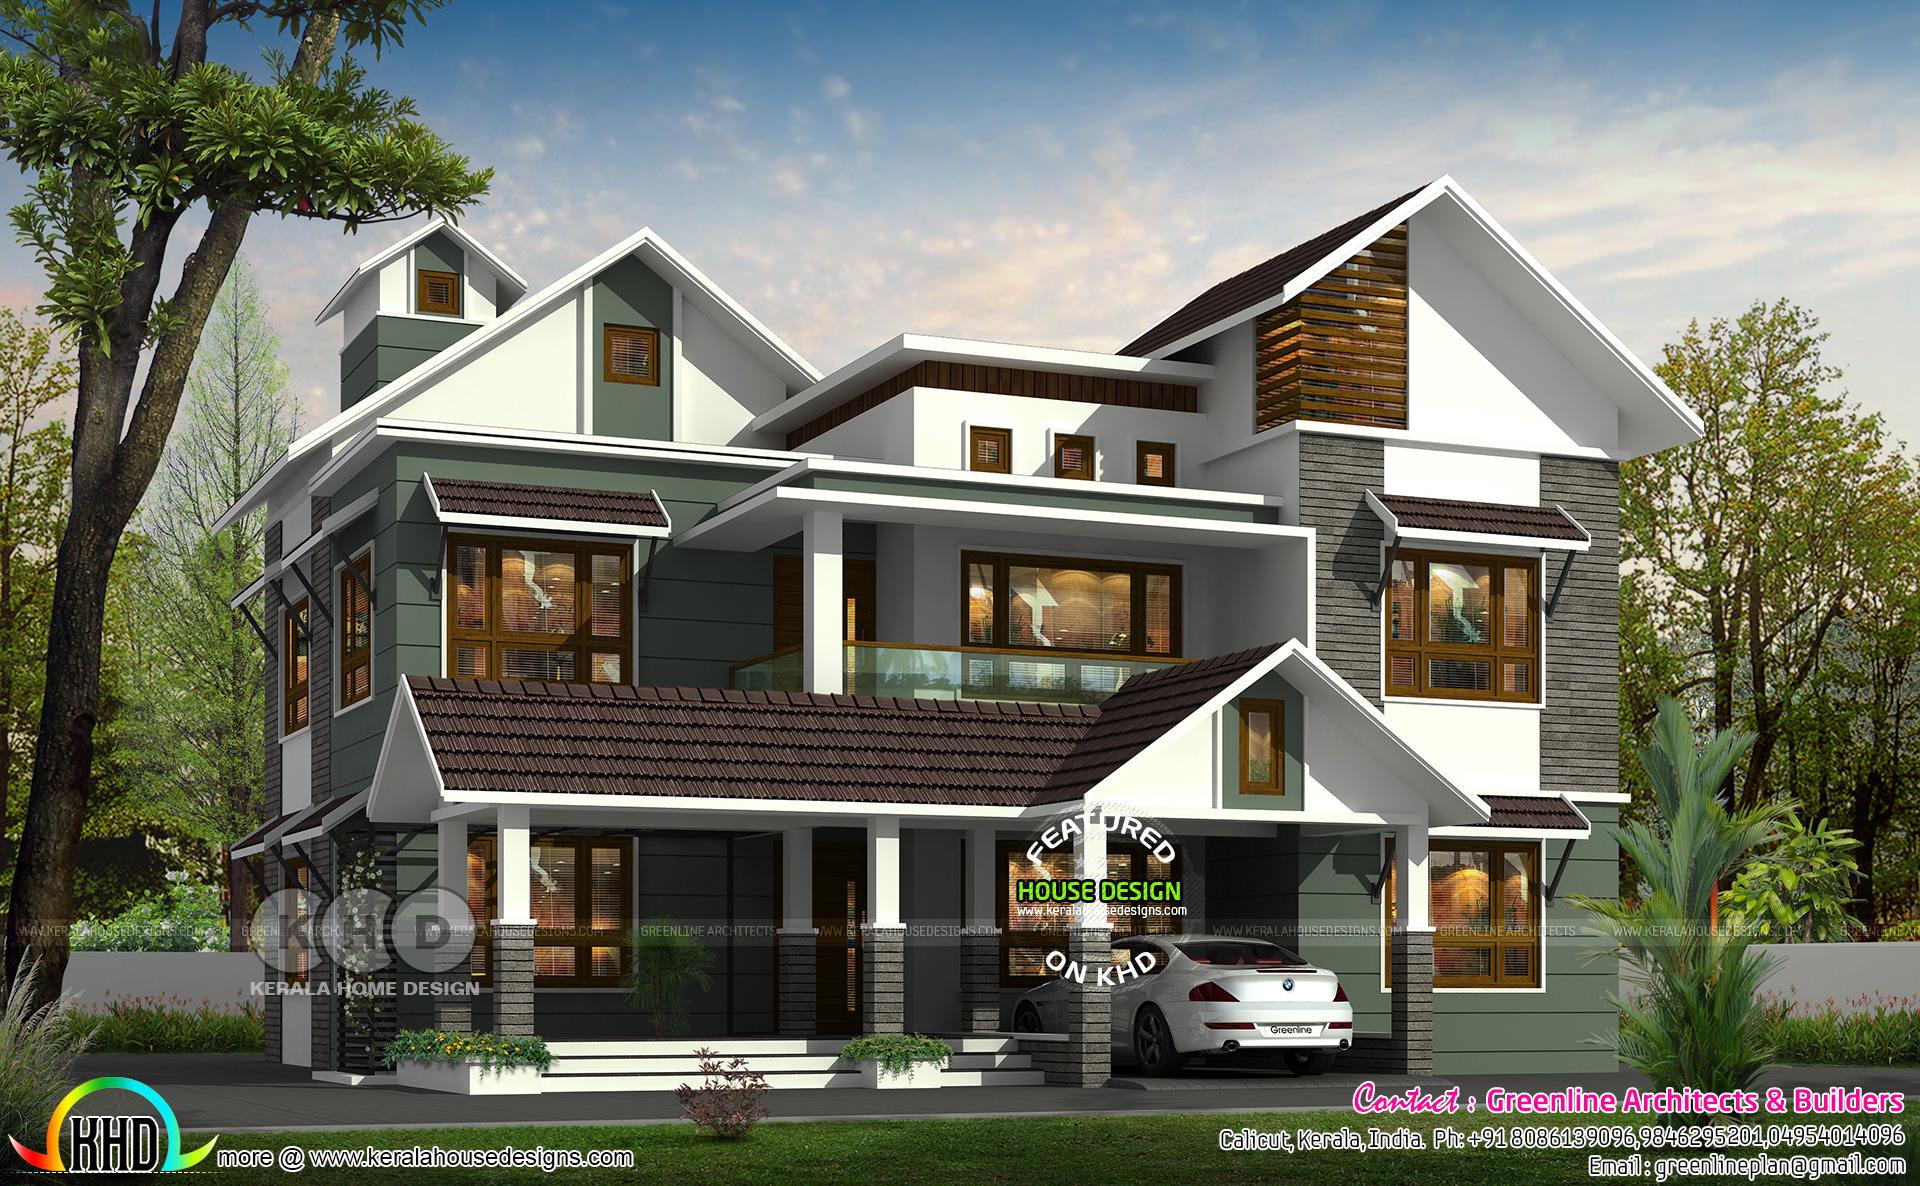 307 Sq M 4 Bhk Mixed Roof House Kerala Home Design Bloglovin